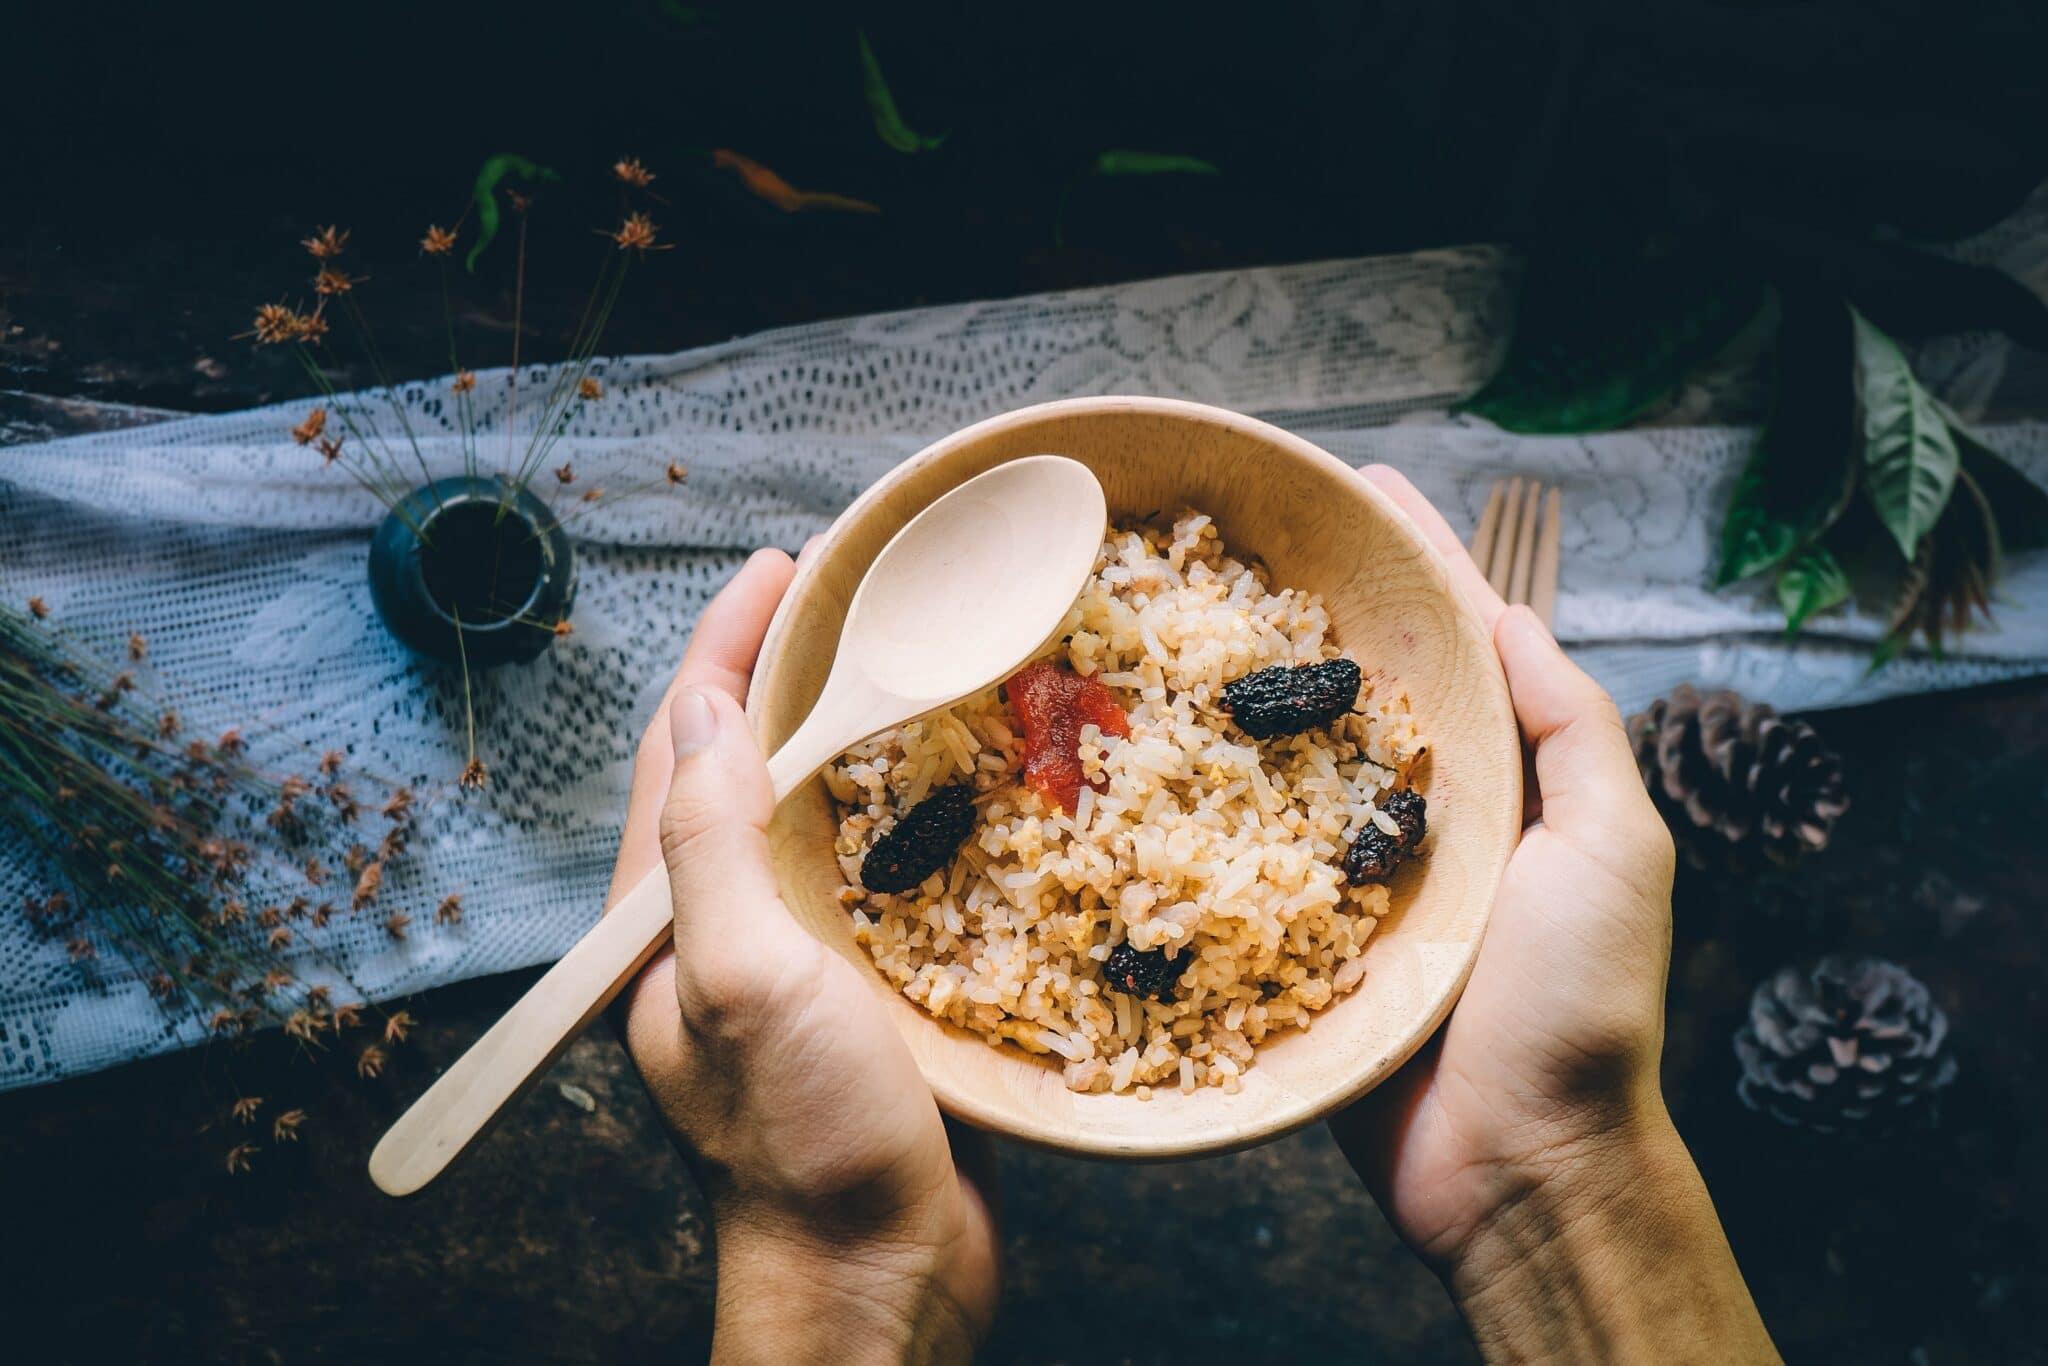 jejum do arroz integral